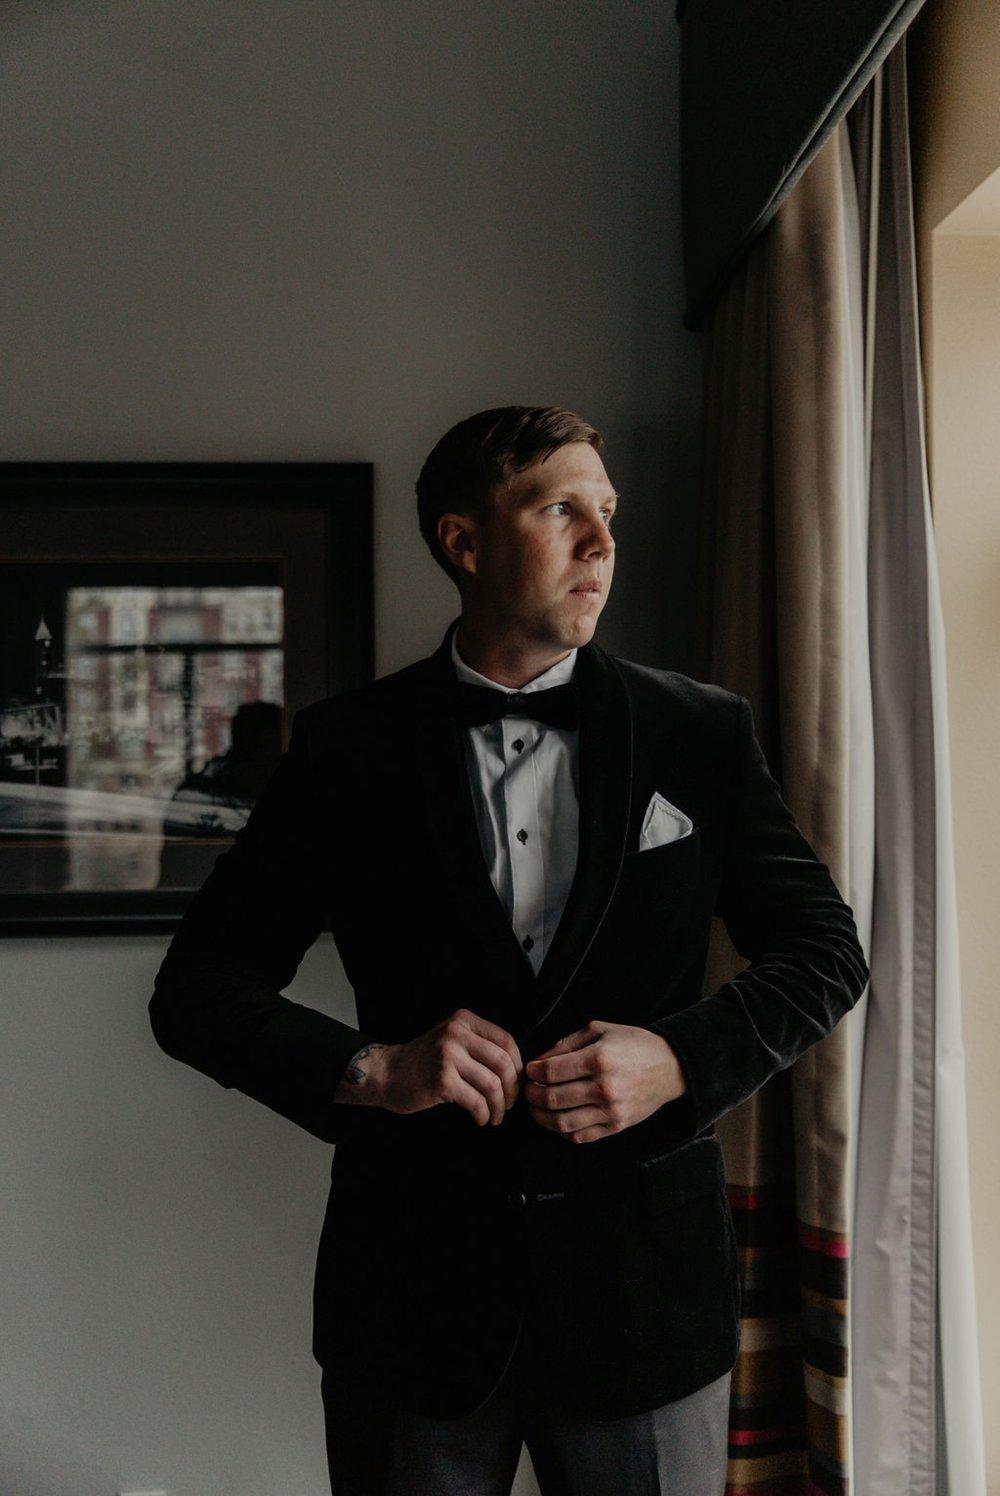 Groom buttoning his suit by the black tux -  Matt Smarsh and Johanna Dye - Raleigh North Carolina Urban Edgy Downtown Wedding